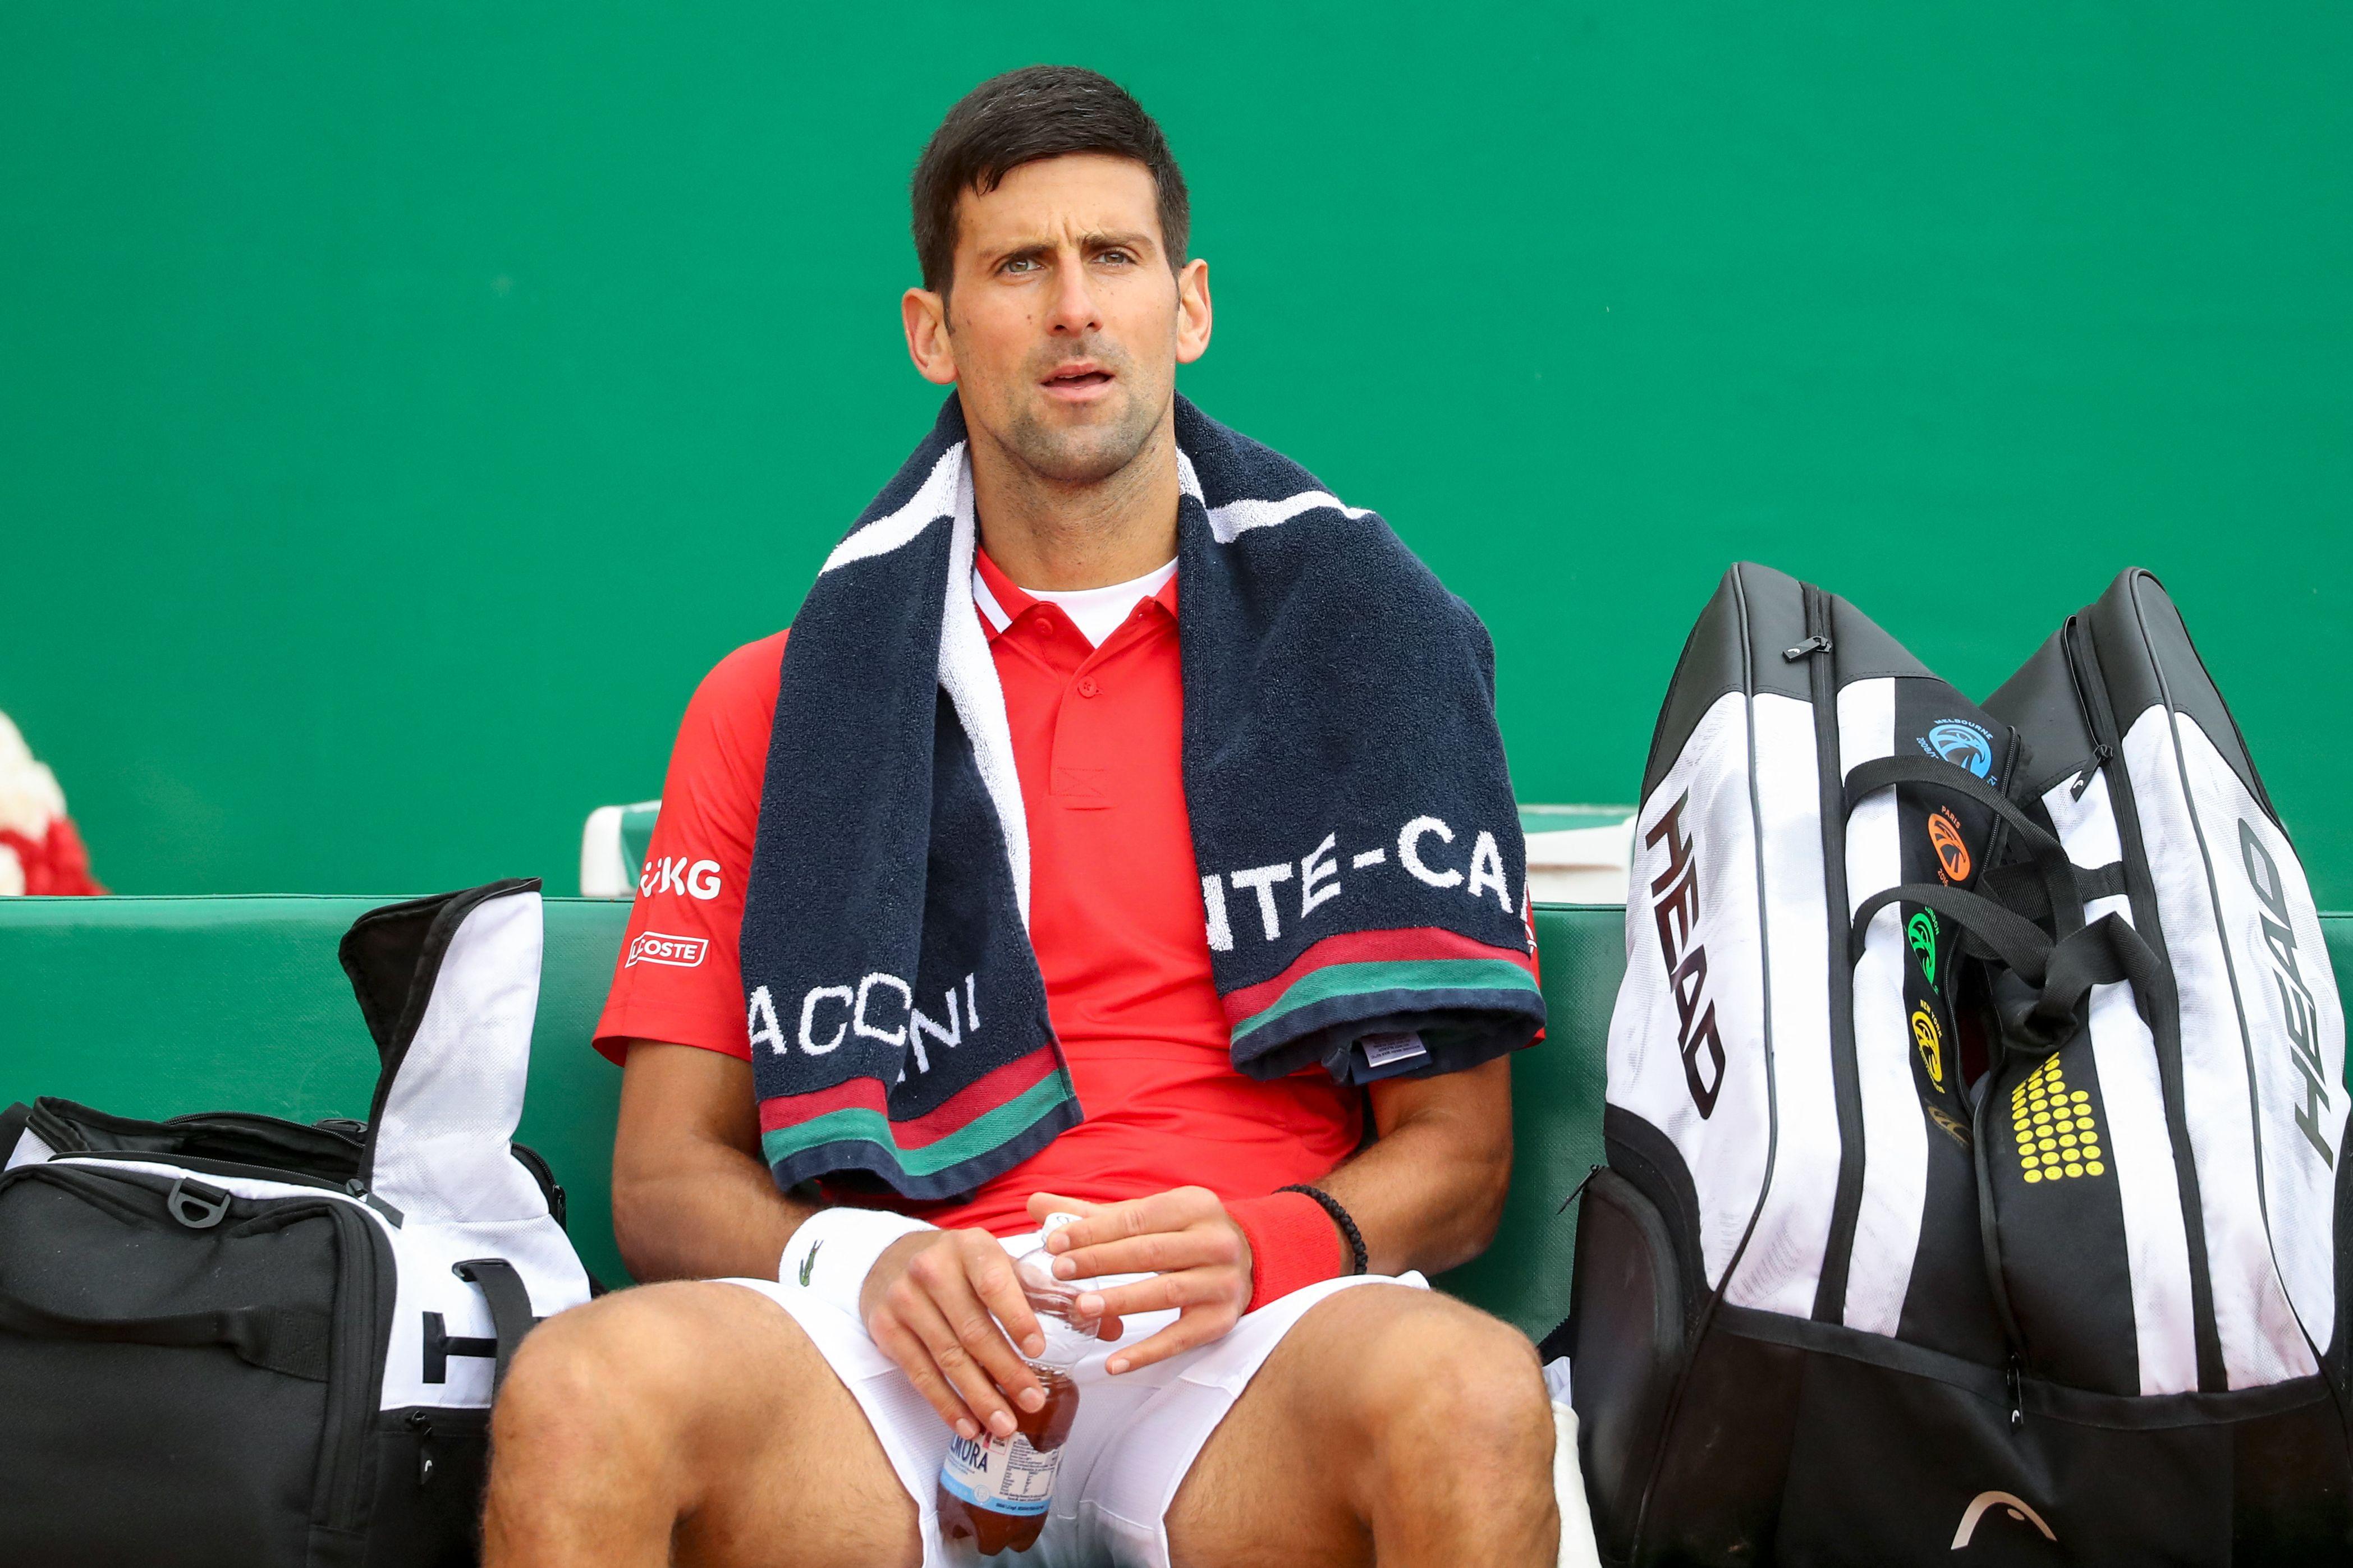 Novak Djokovic says he hopes Covid-19 vaccine will not be mandatory for players